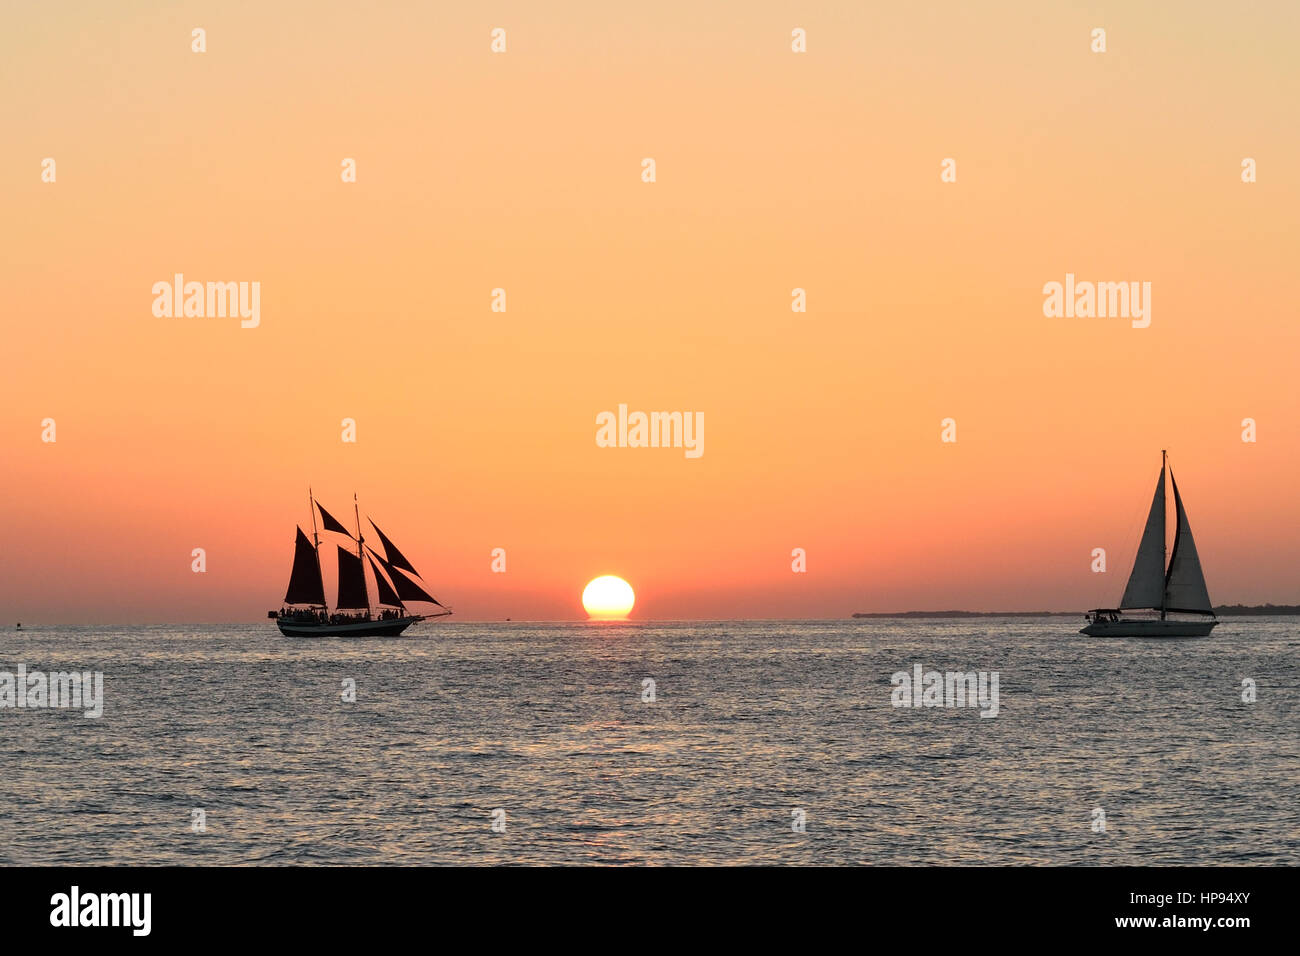 Veleros en frente de un hermoso atardecer de Key West. Tomado de Malory Square Imagen De Stock